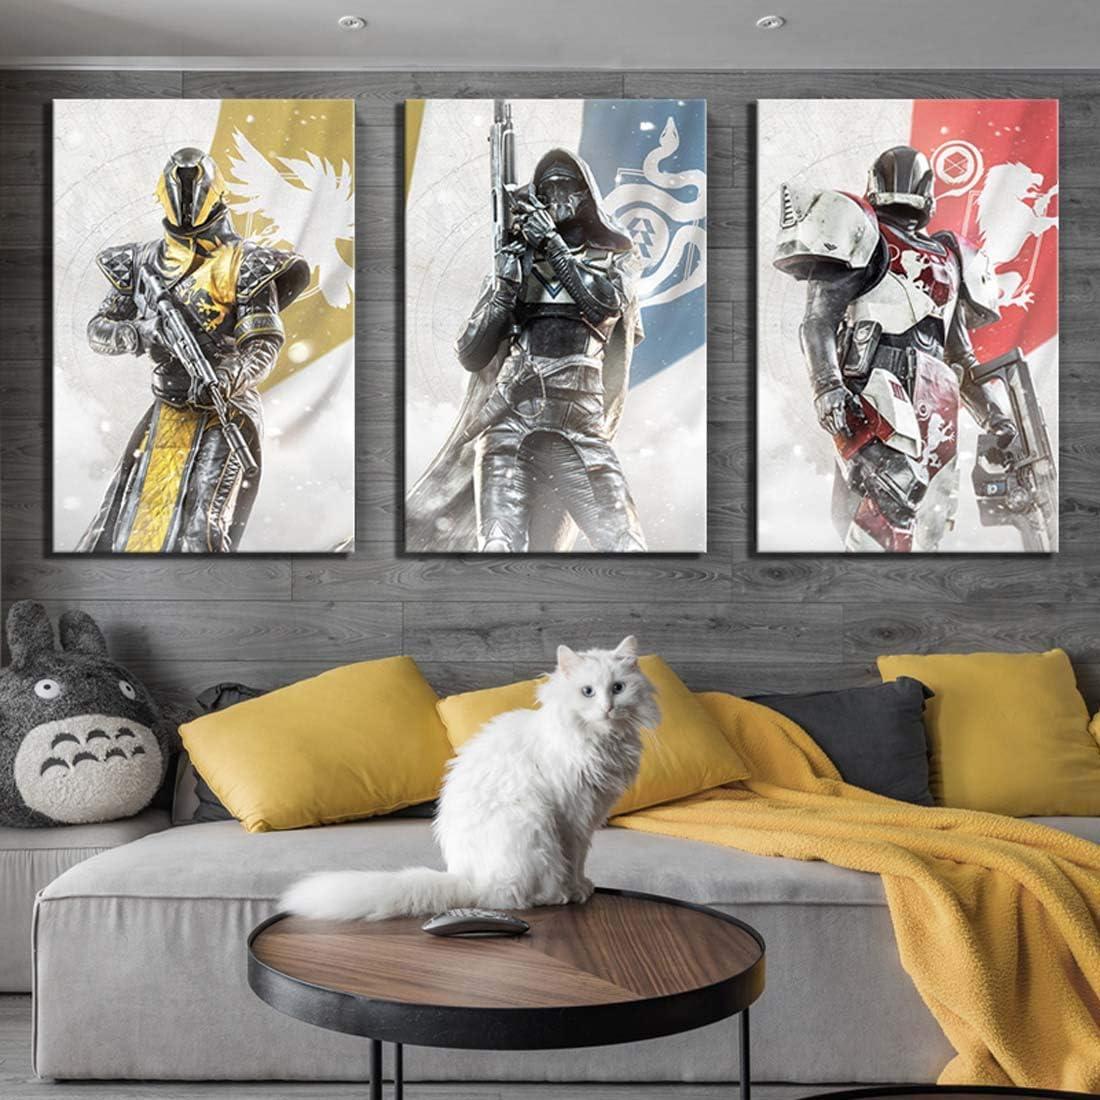 HSART Art Canvas Paintings 3 Piece Destiny 2 Guardians HD Print Game Poster Wall Art for Home Decor,B,40x60cmx3